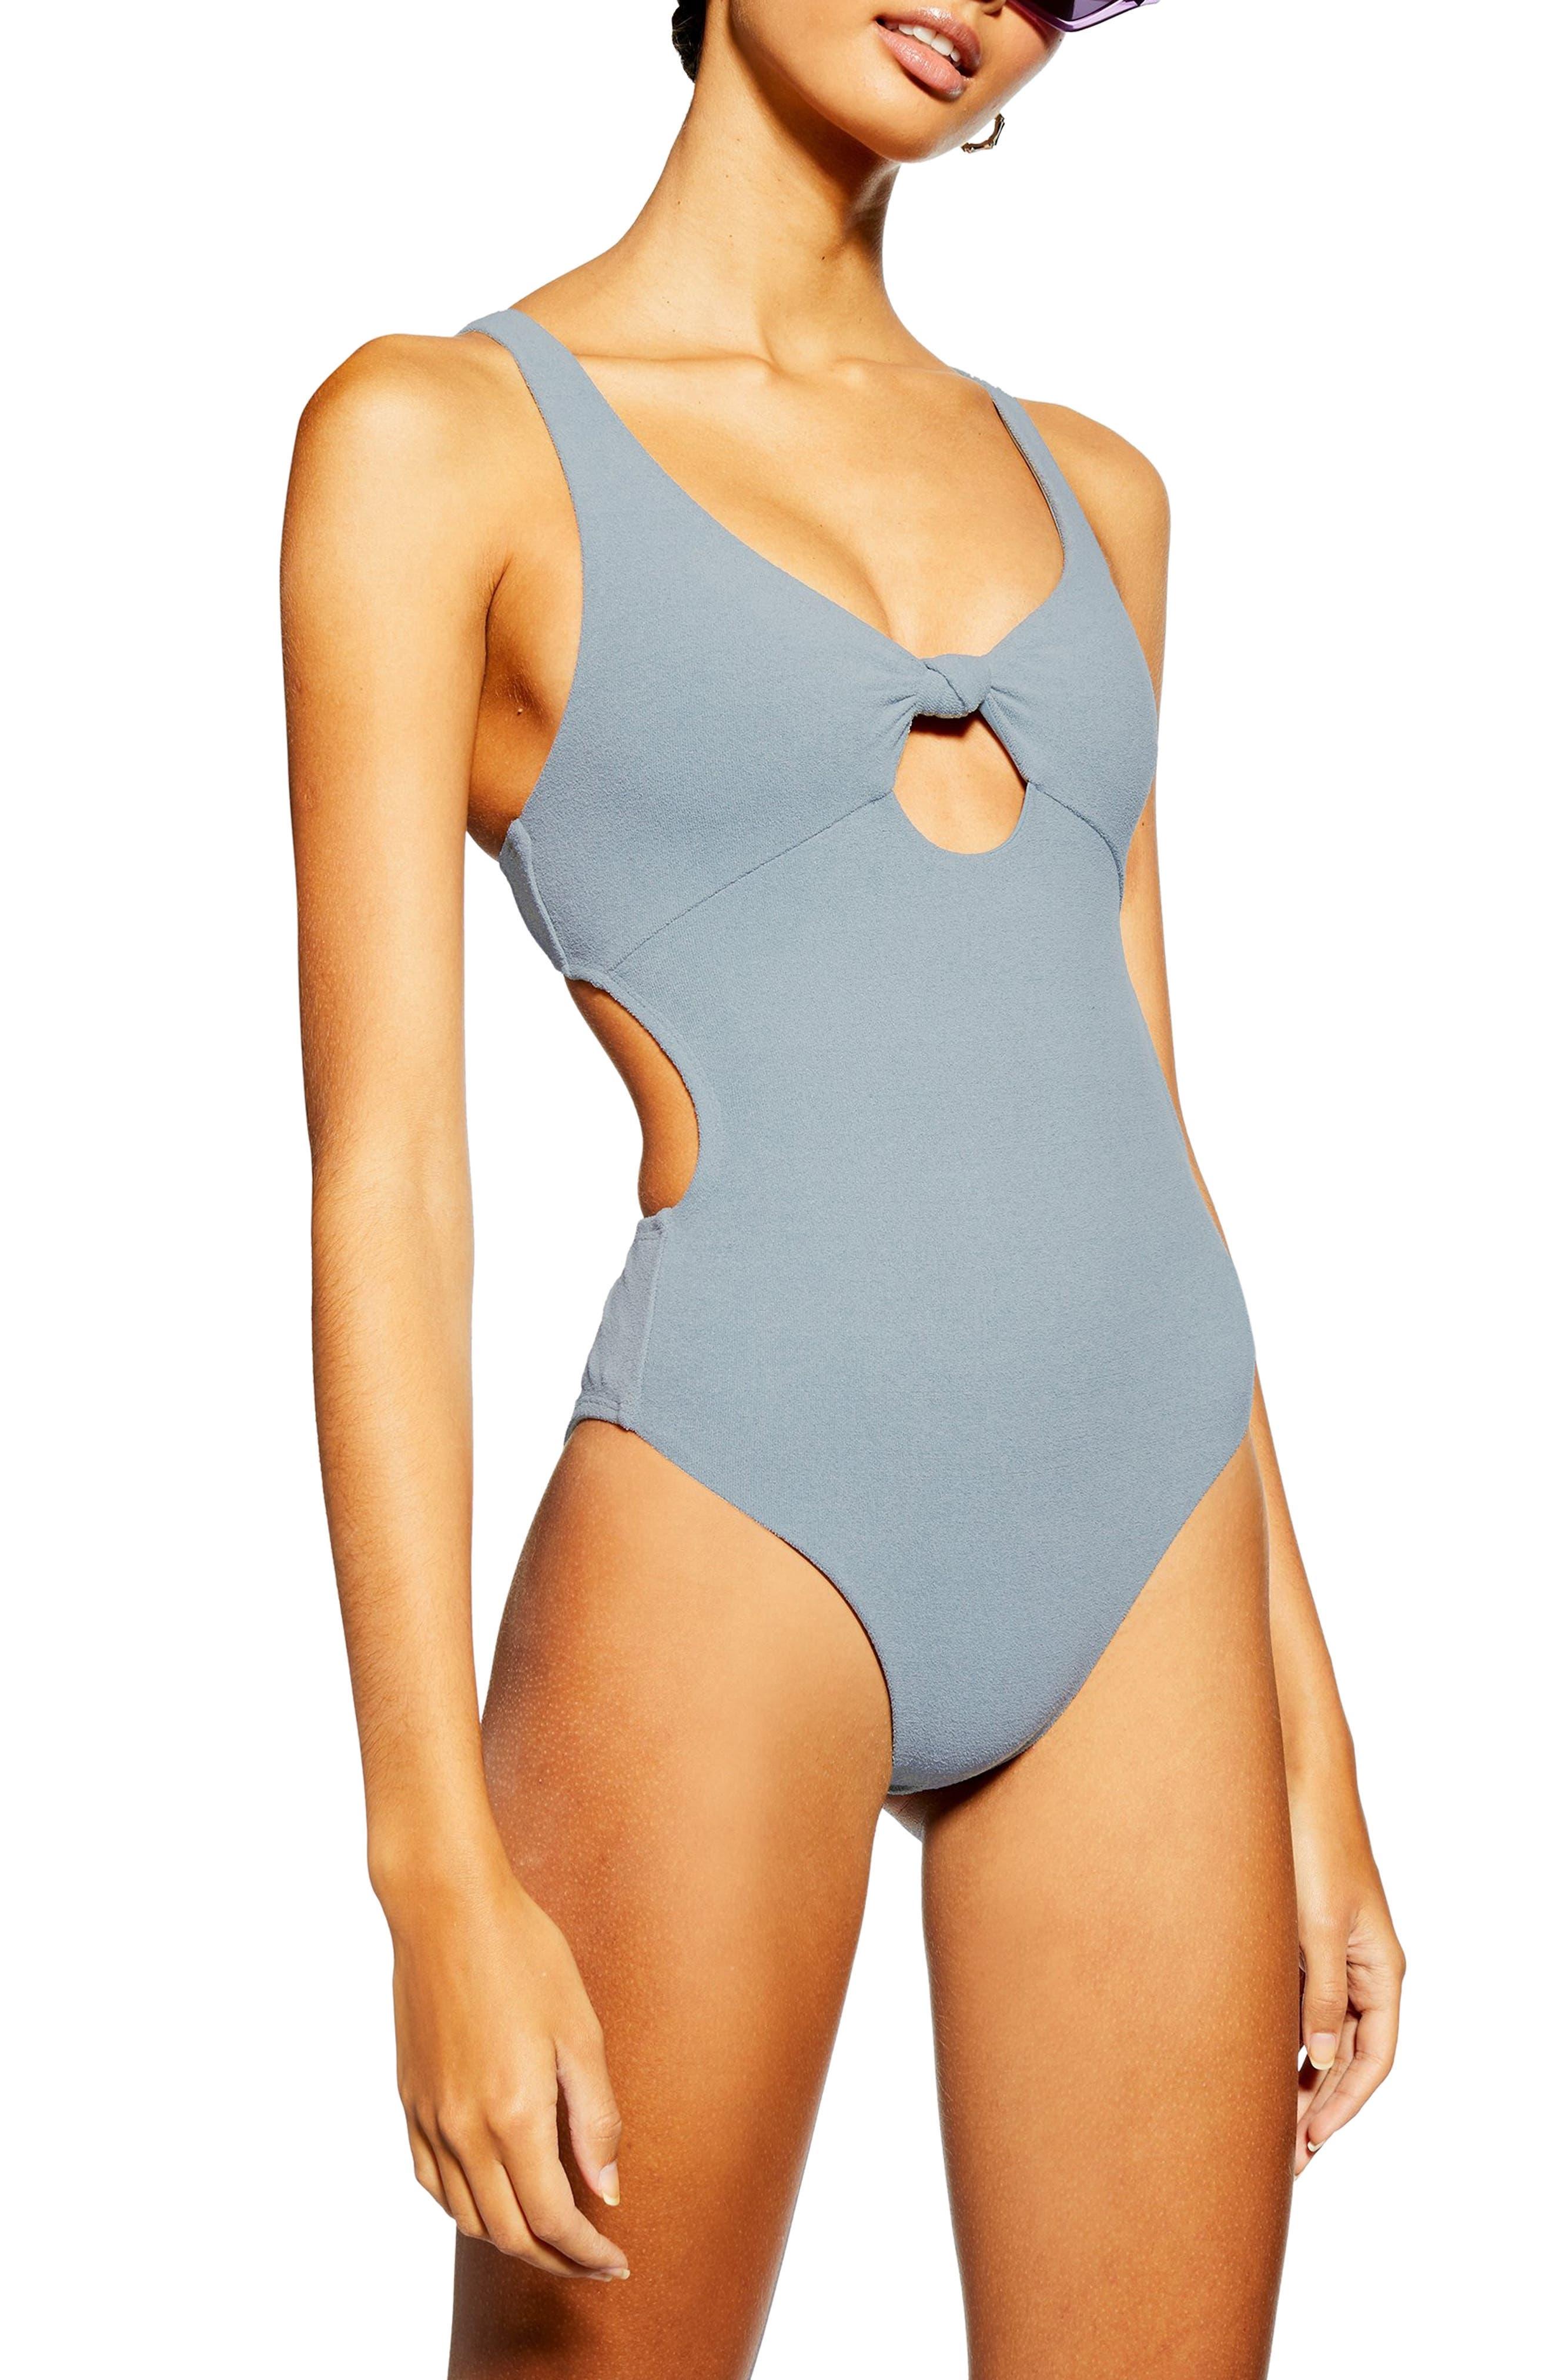 TOPSHOP Knot Velour One-Piece Swimsuit, Main, color, GREY